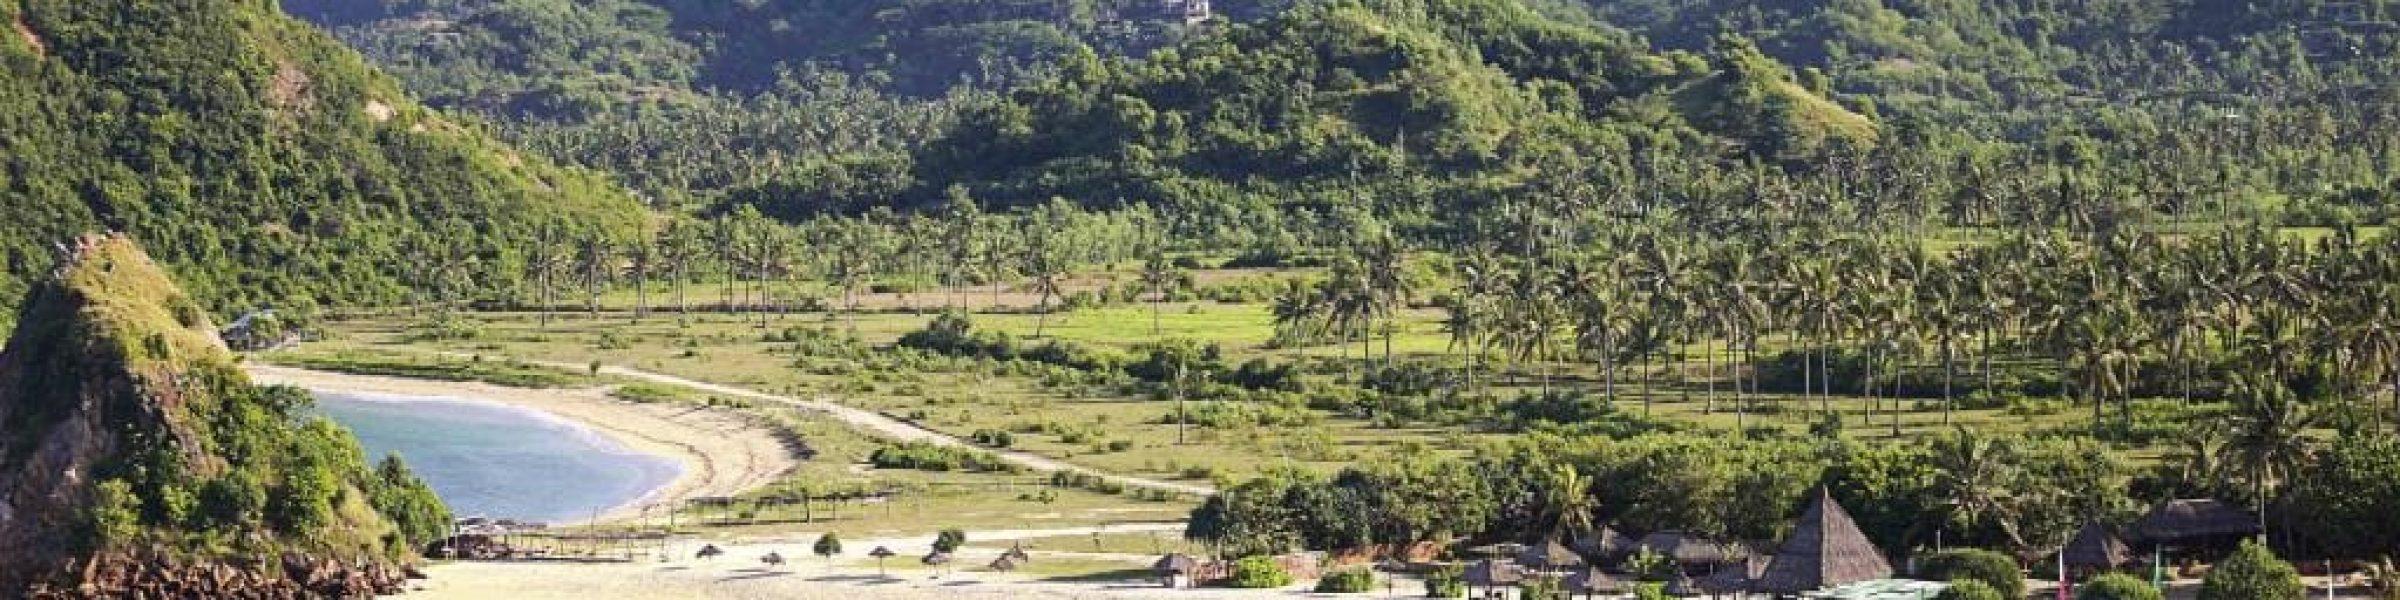 Kuta Mandalika in Lombok